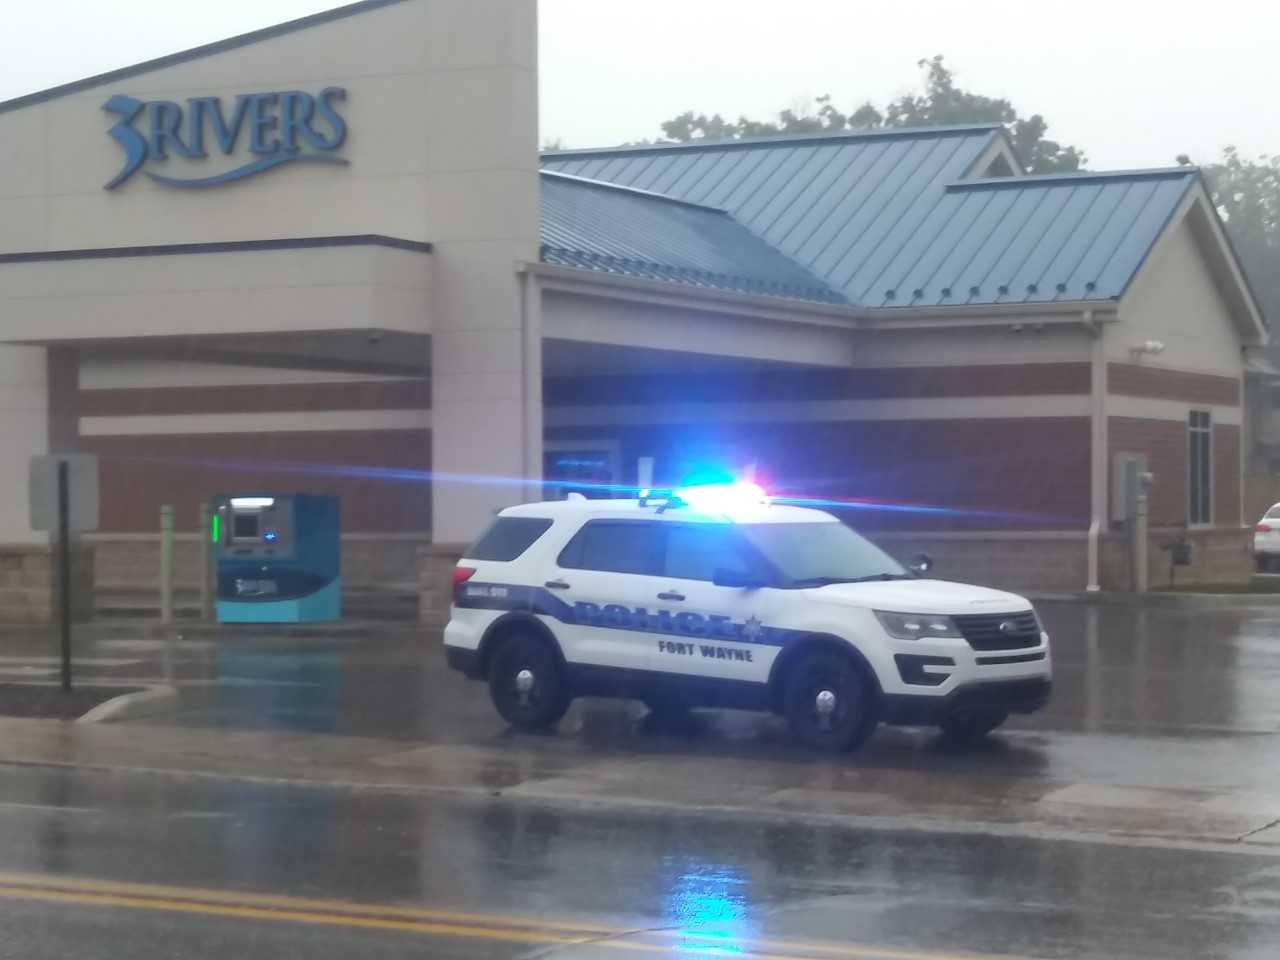 3rivers bank robbery_1537916245316.jpg.jpg